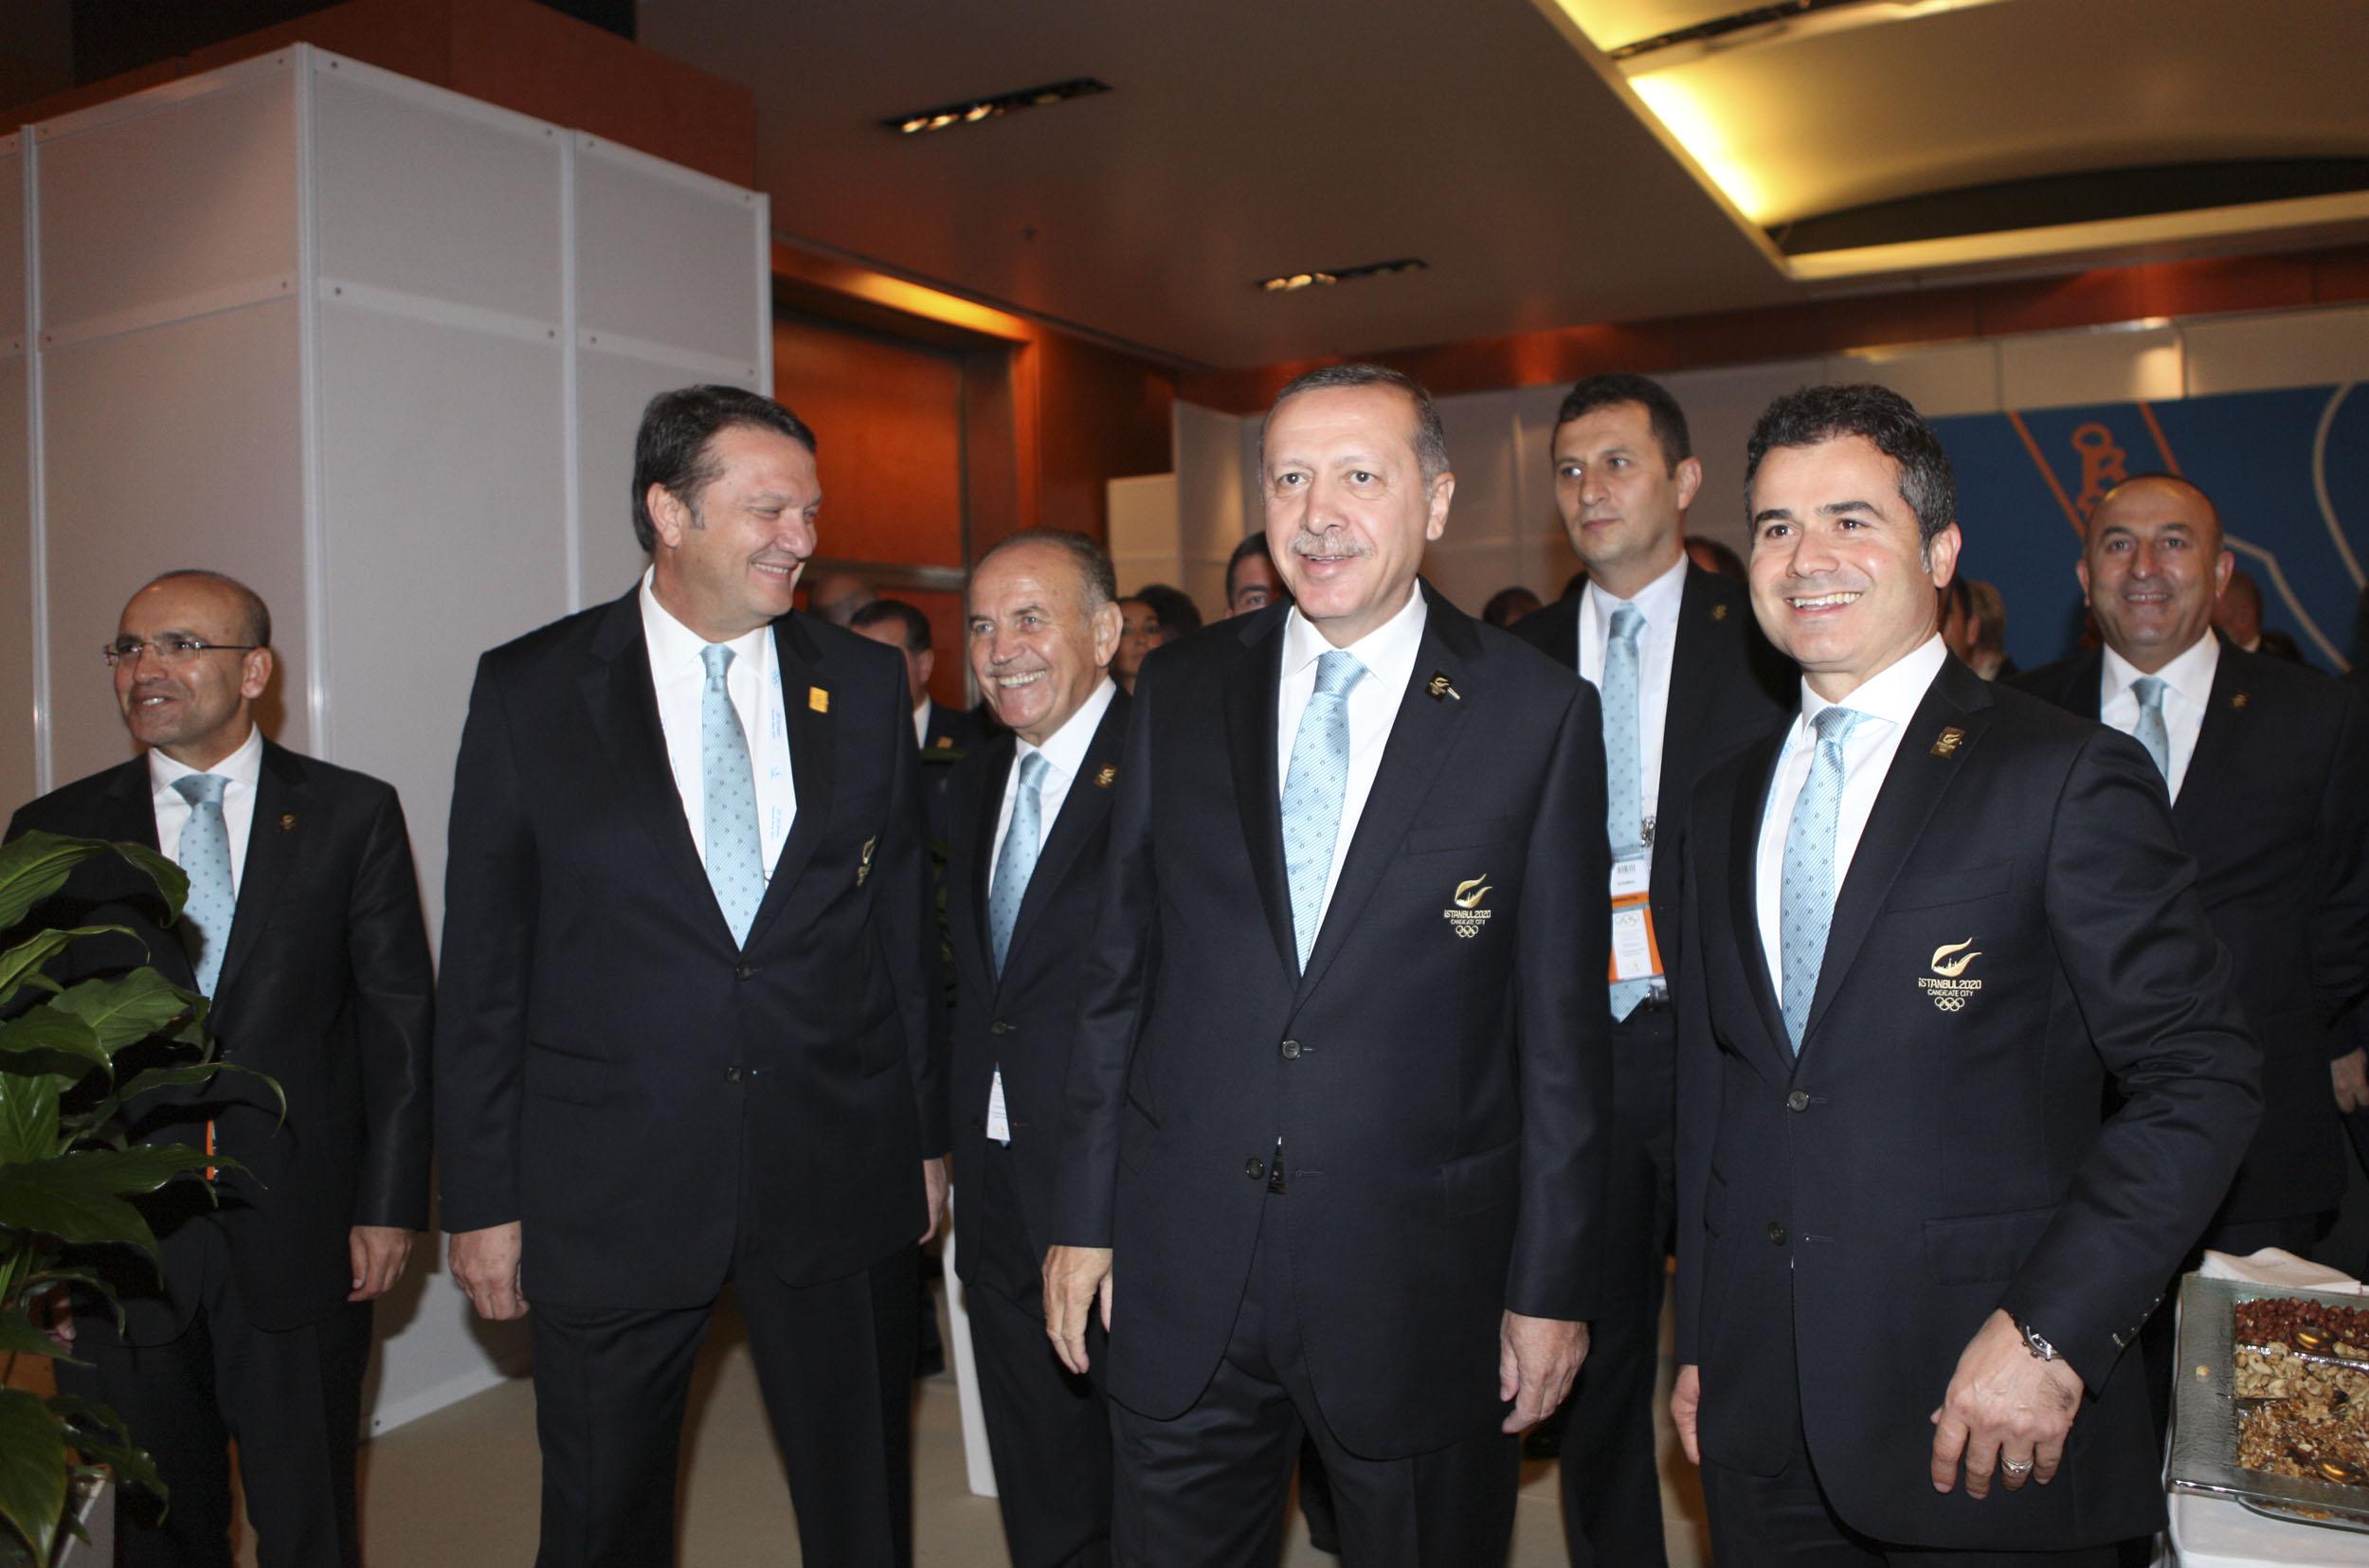 Turkish Prime Minister Recep Tayyip Erdogan alongside the 2020 team